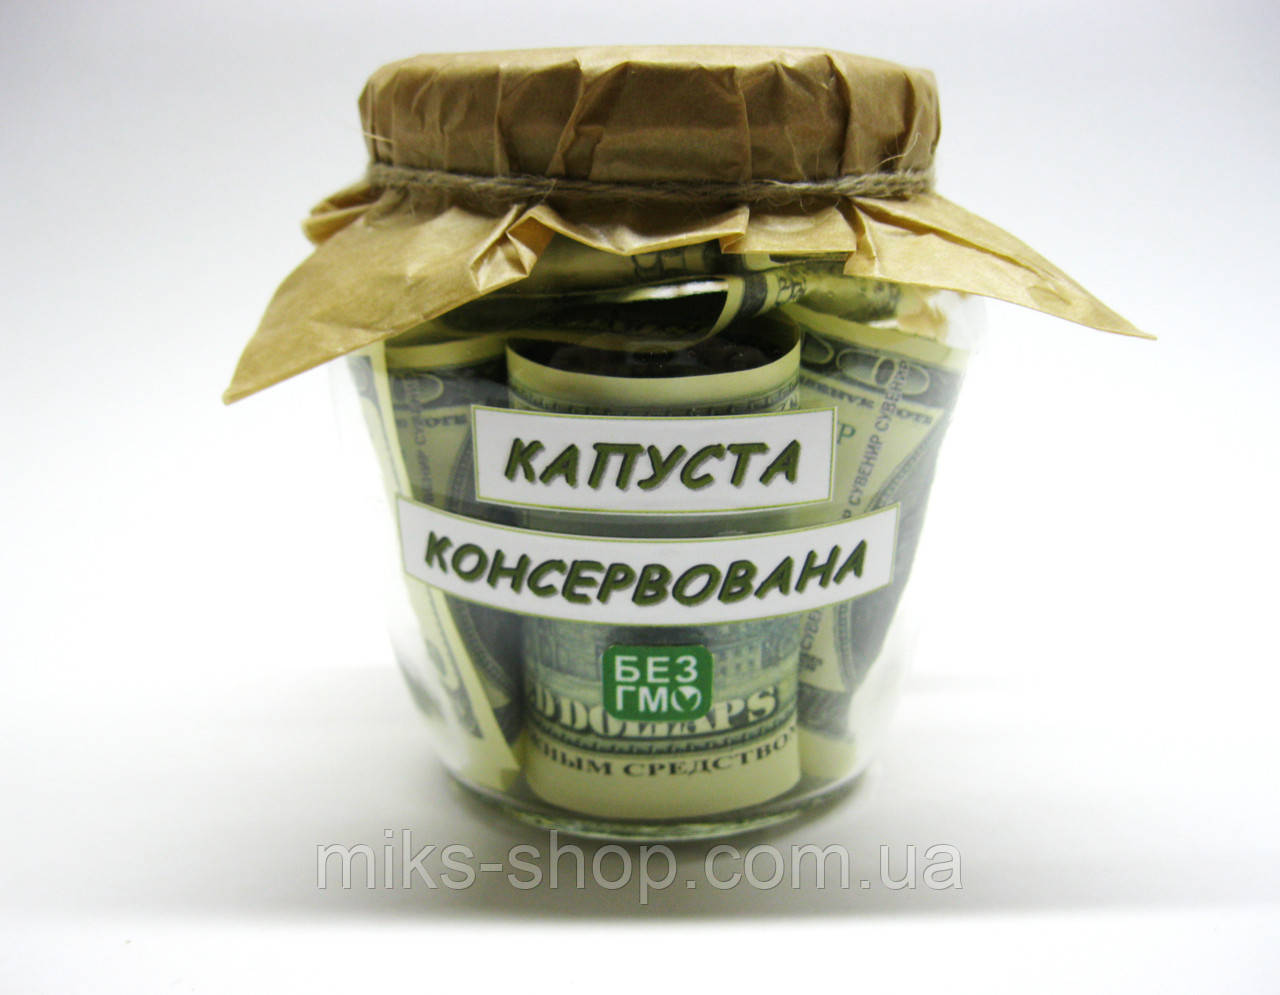 Сувенир Денежная банка